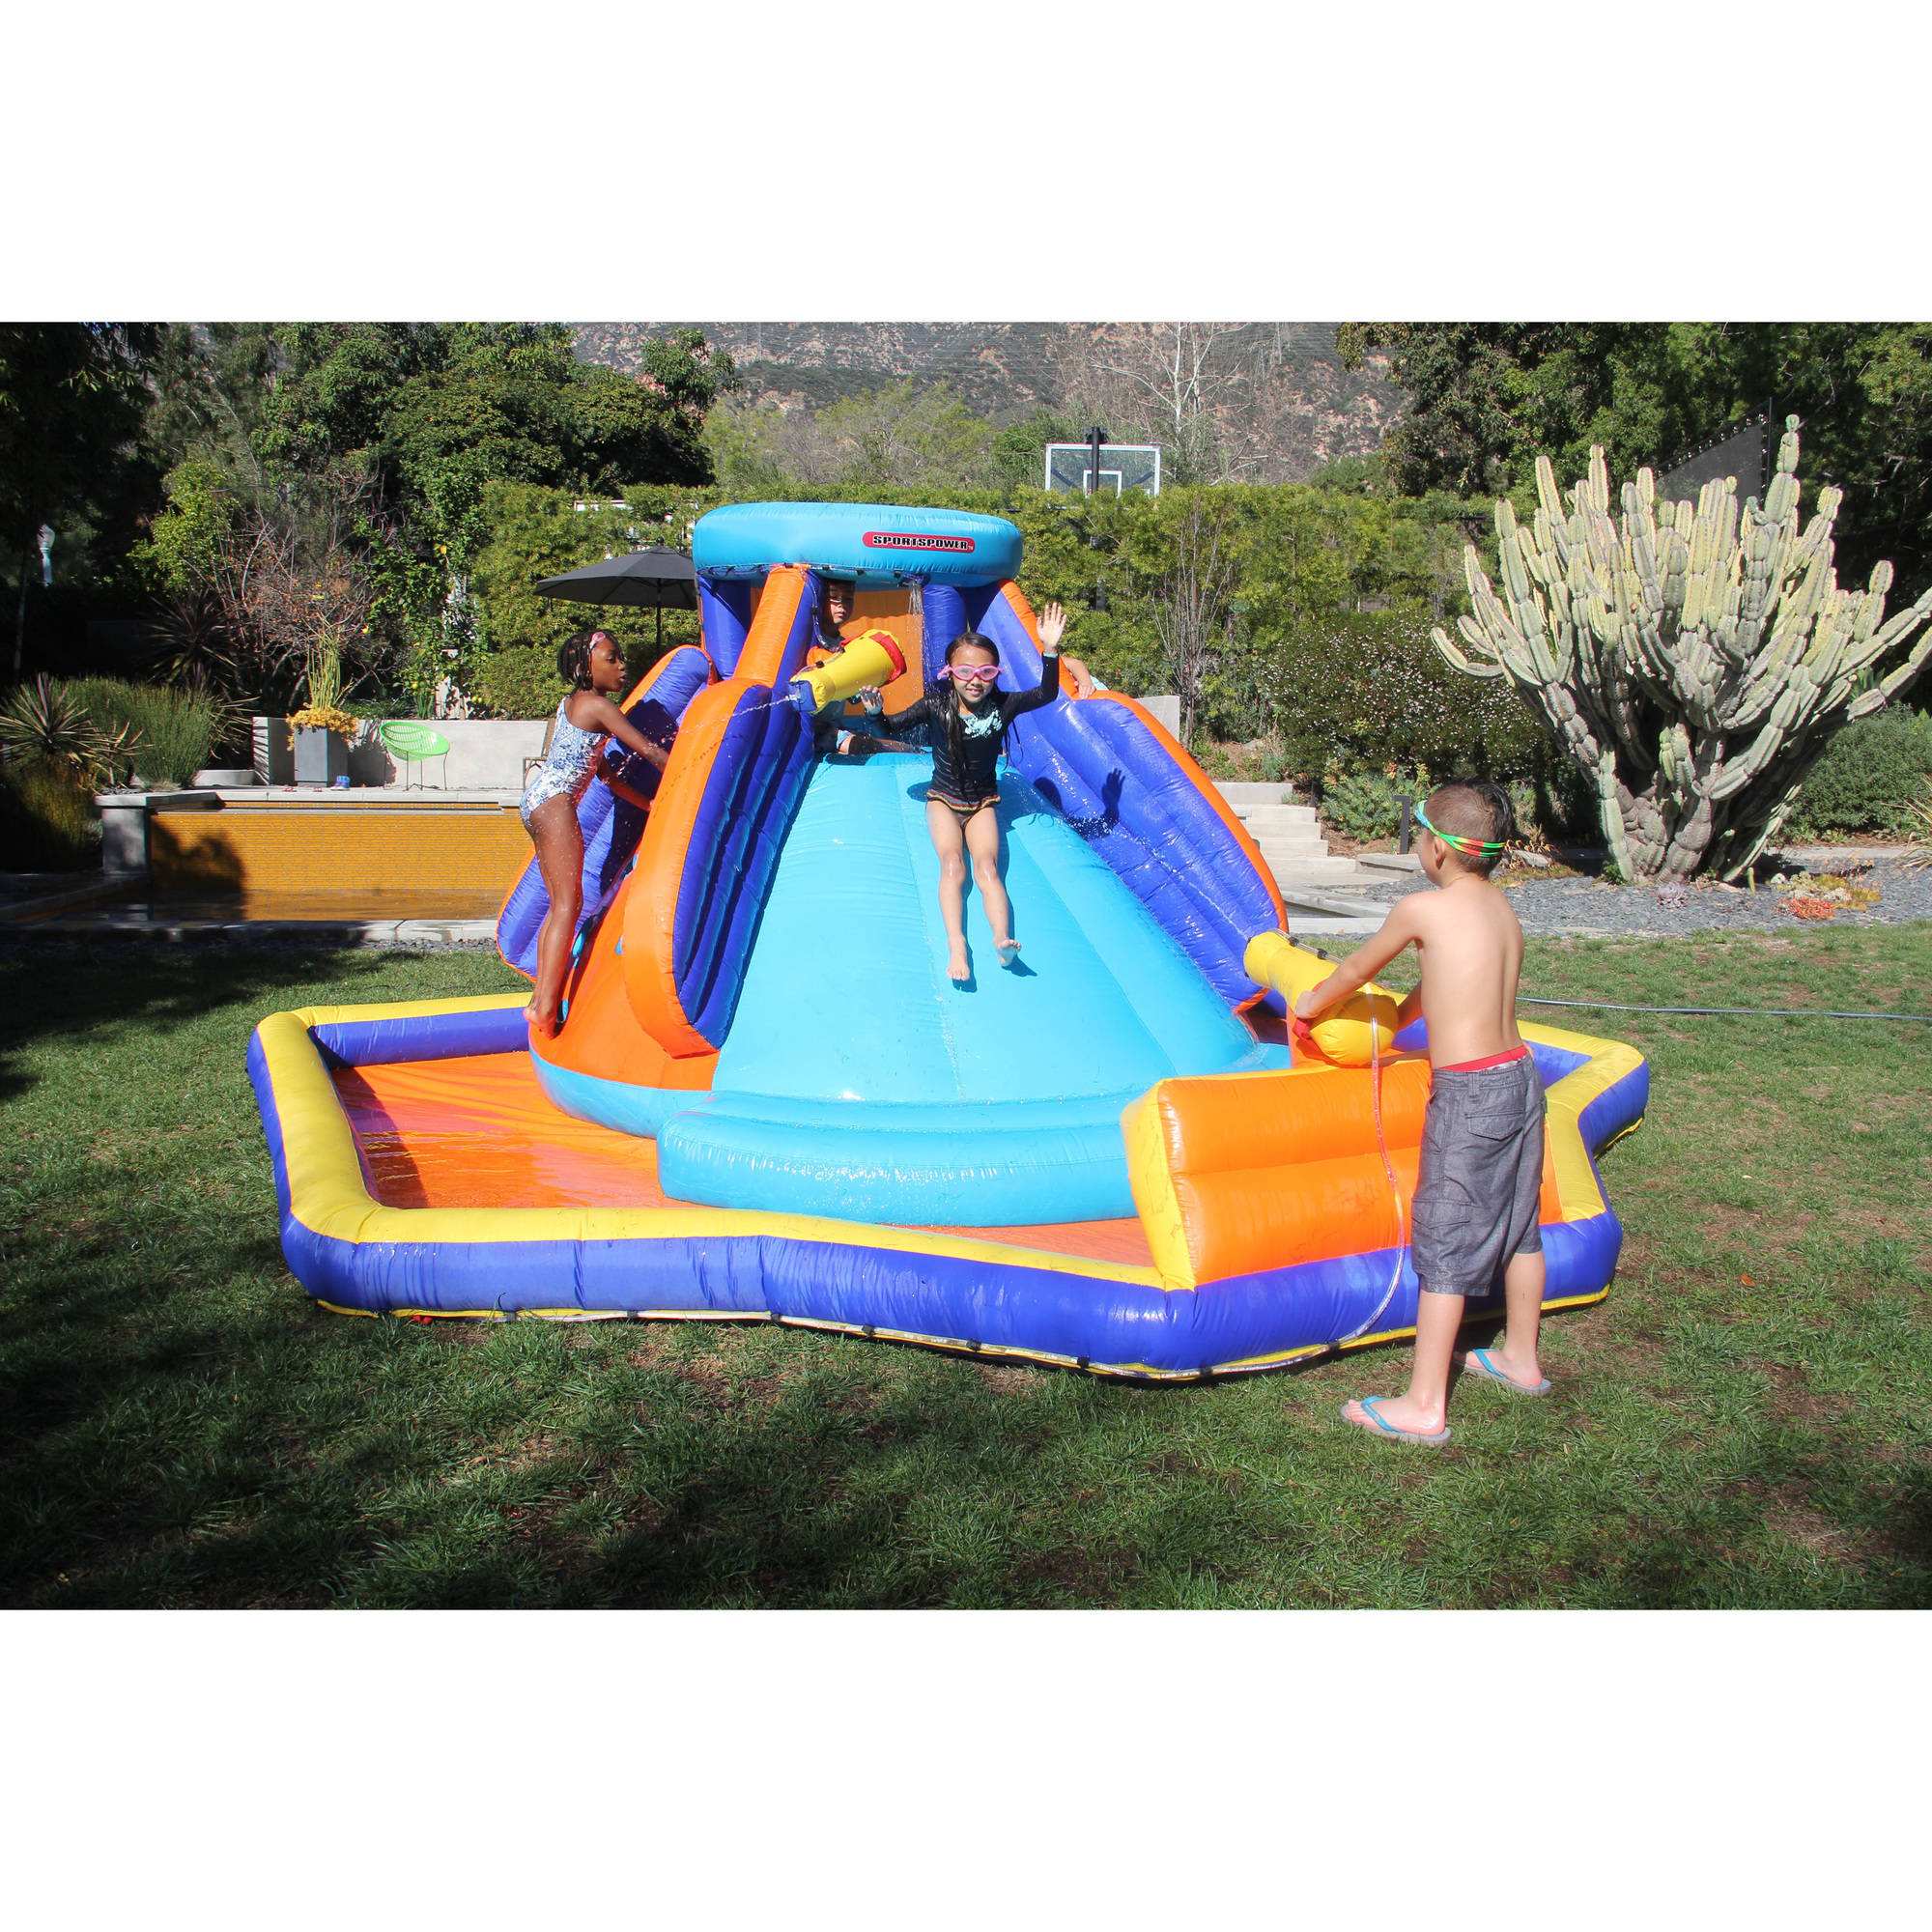 Inflatable Sportspower Battle Ridge Water Slide Outdoor